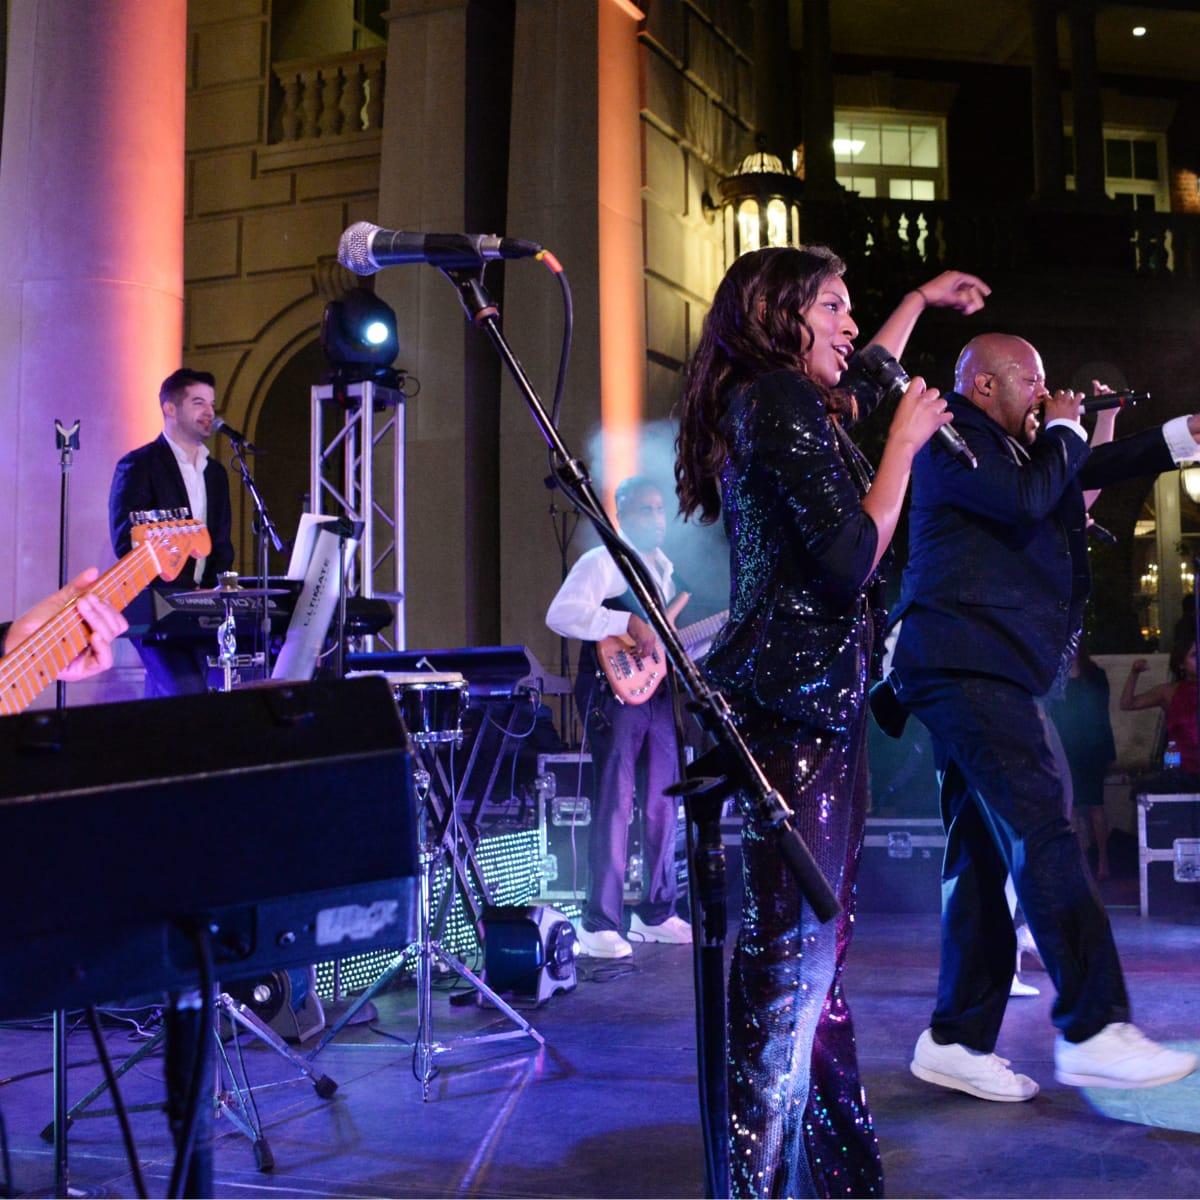 Emerald City Band at Treasure Street 2016 in Dallas